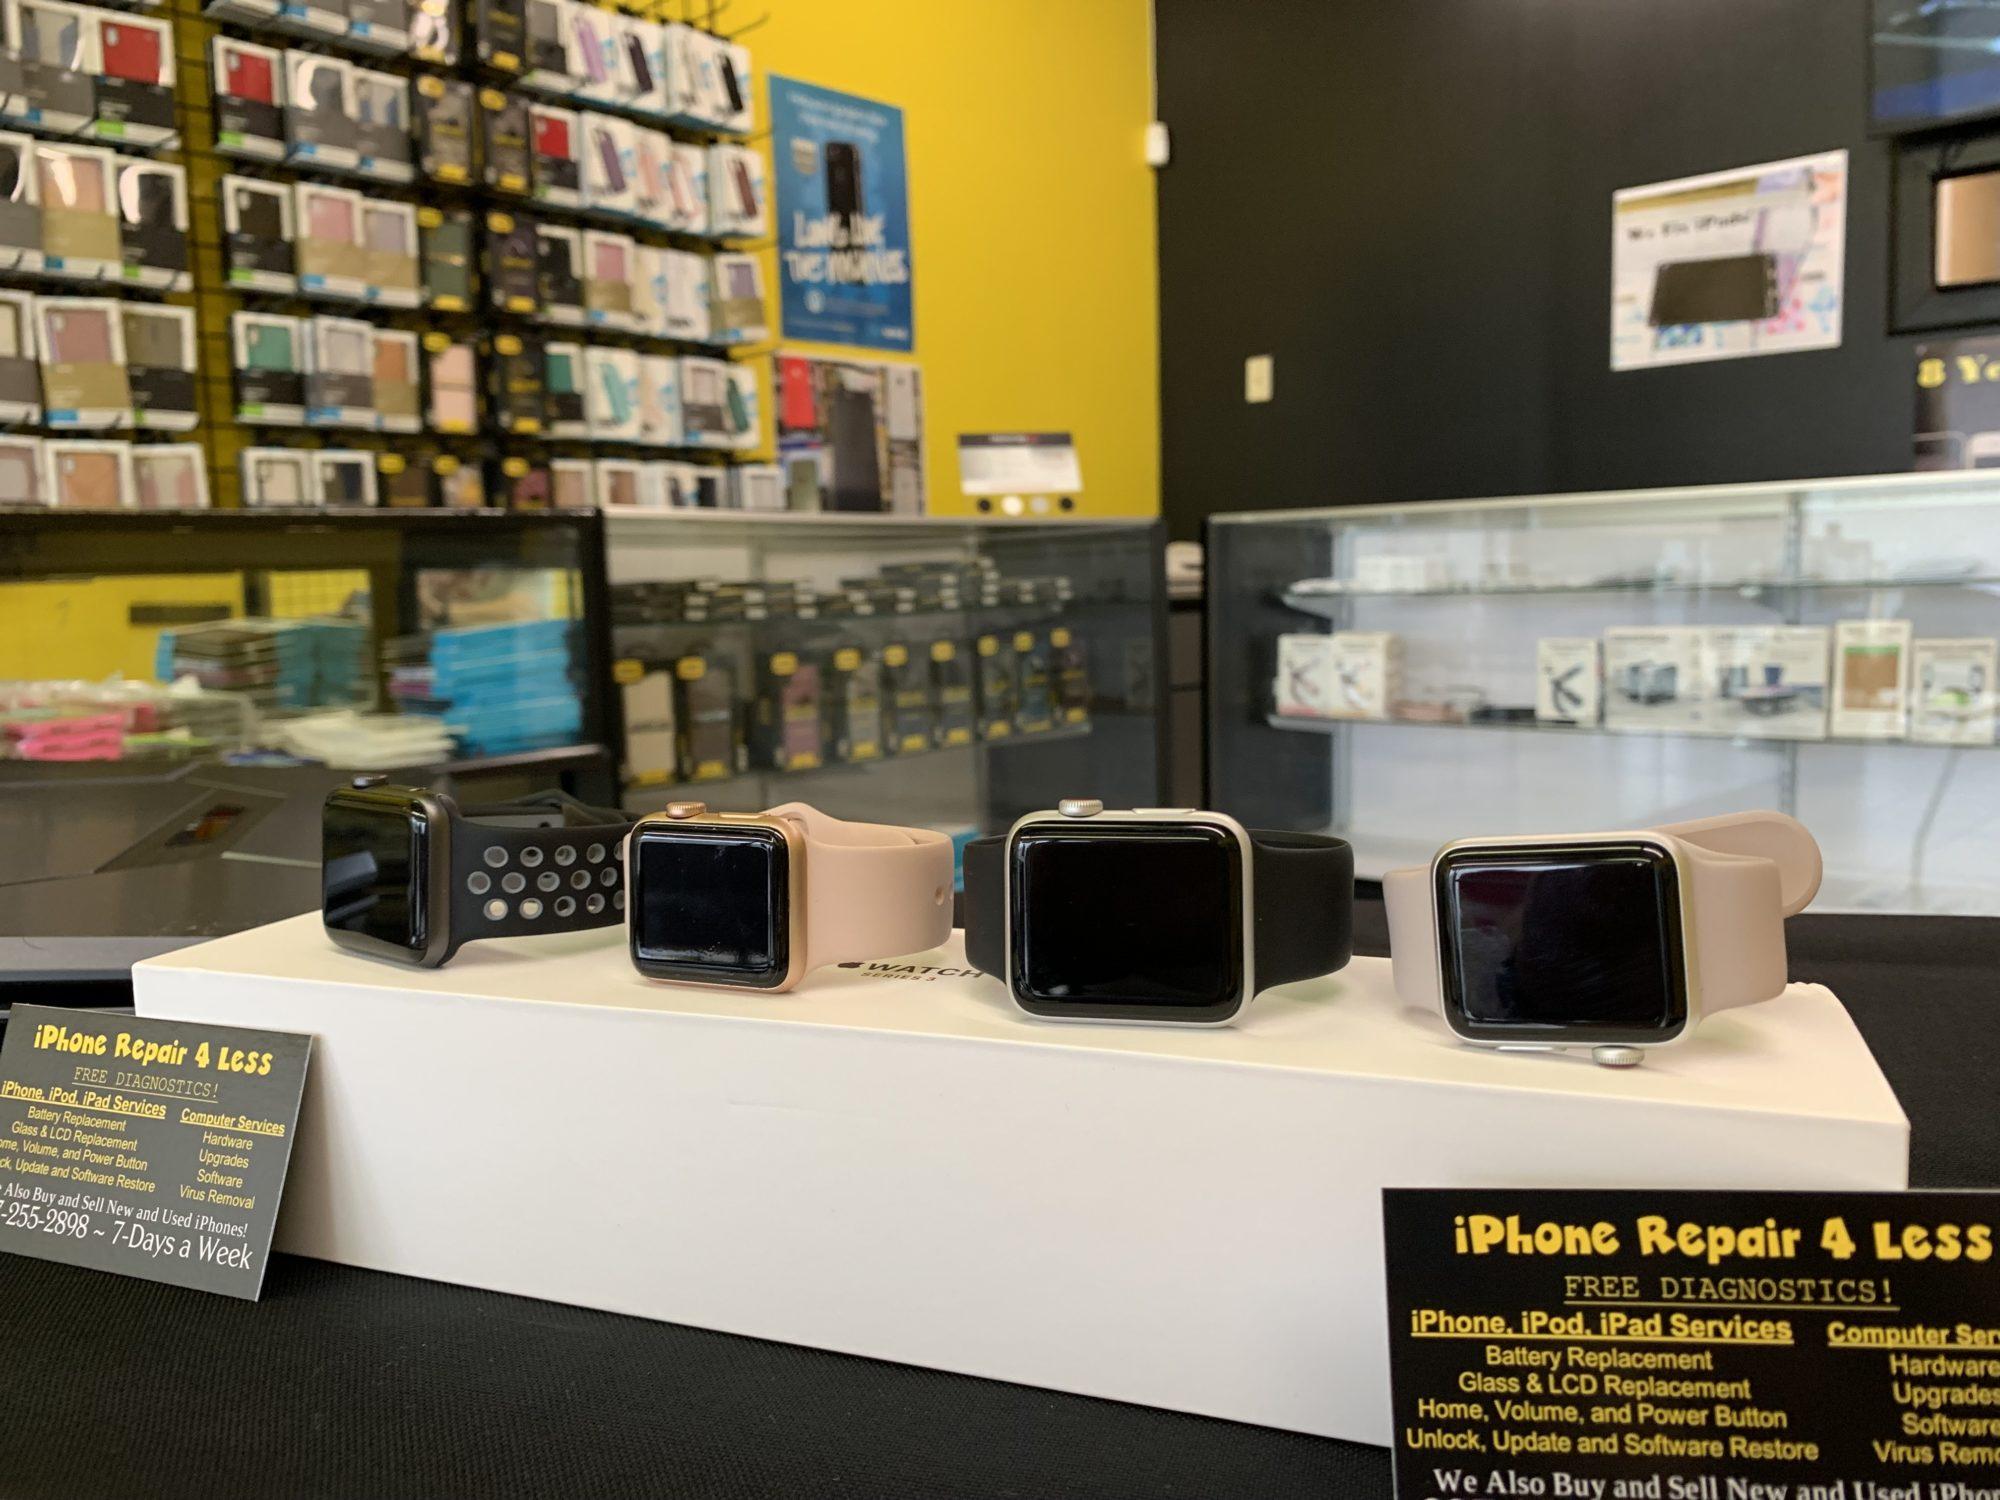 Apple Watch Giveaway! | iPhone Repair 4 Less